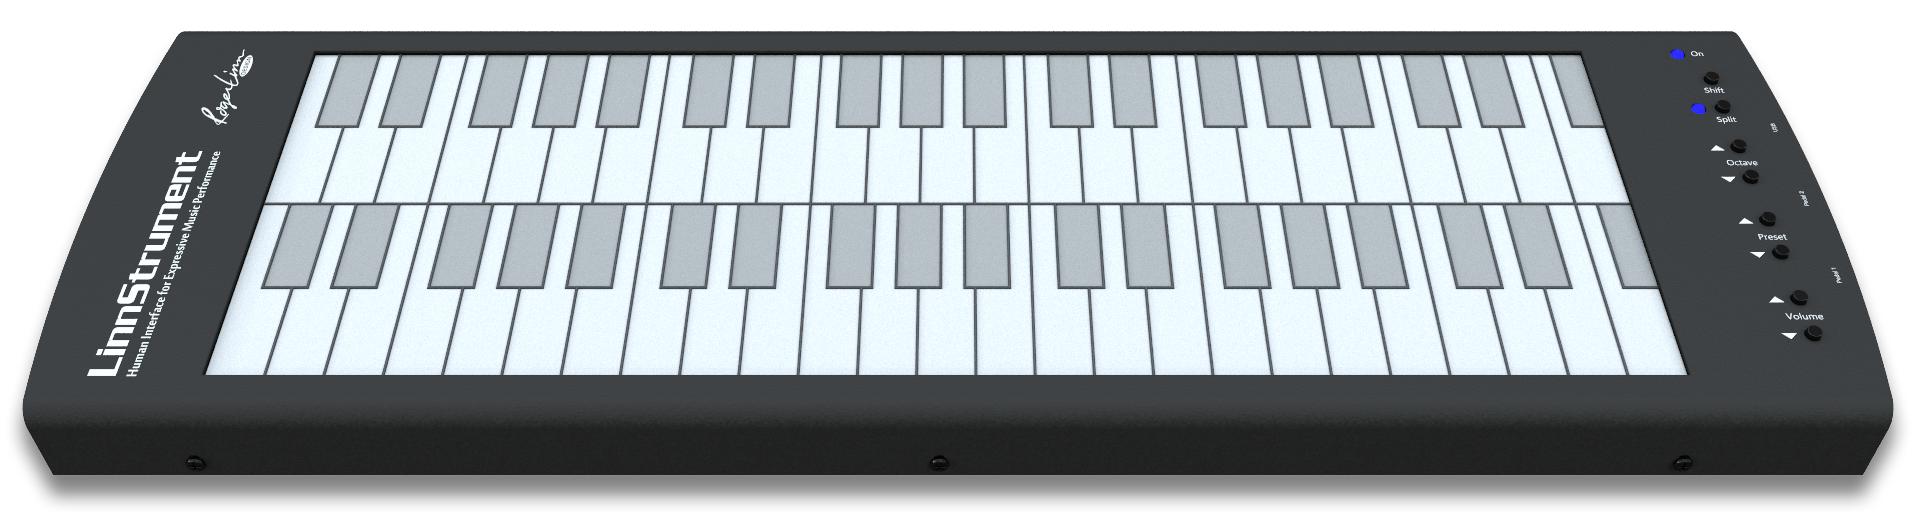 LinnStrument_piano_shadow[1]